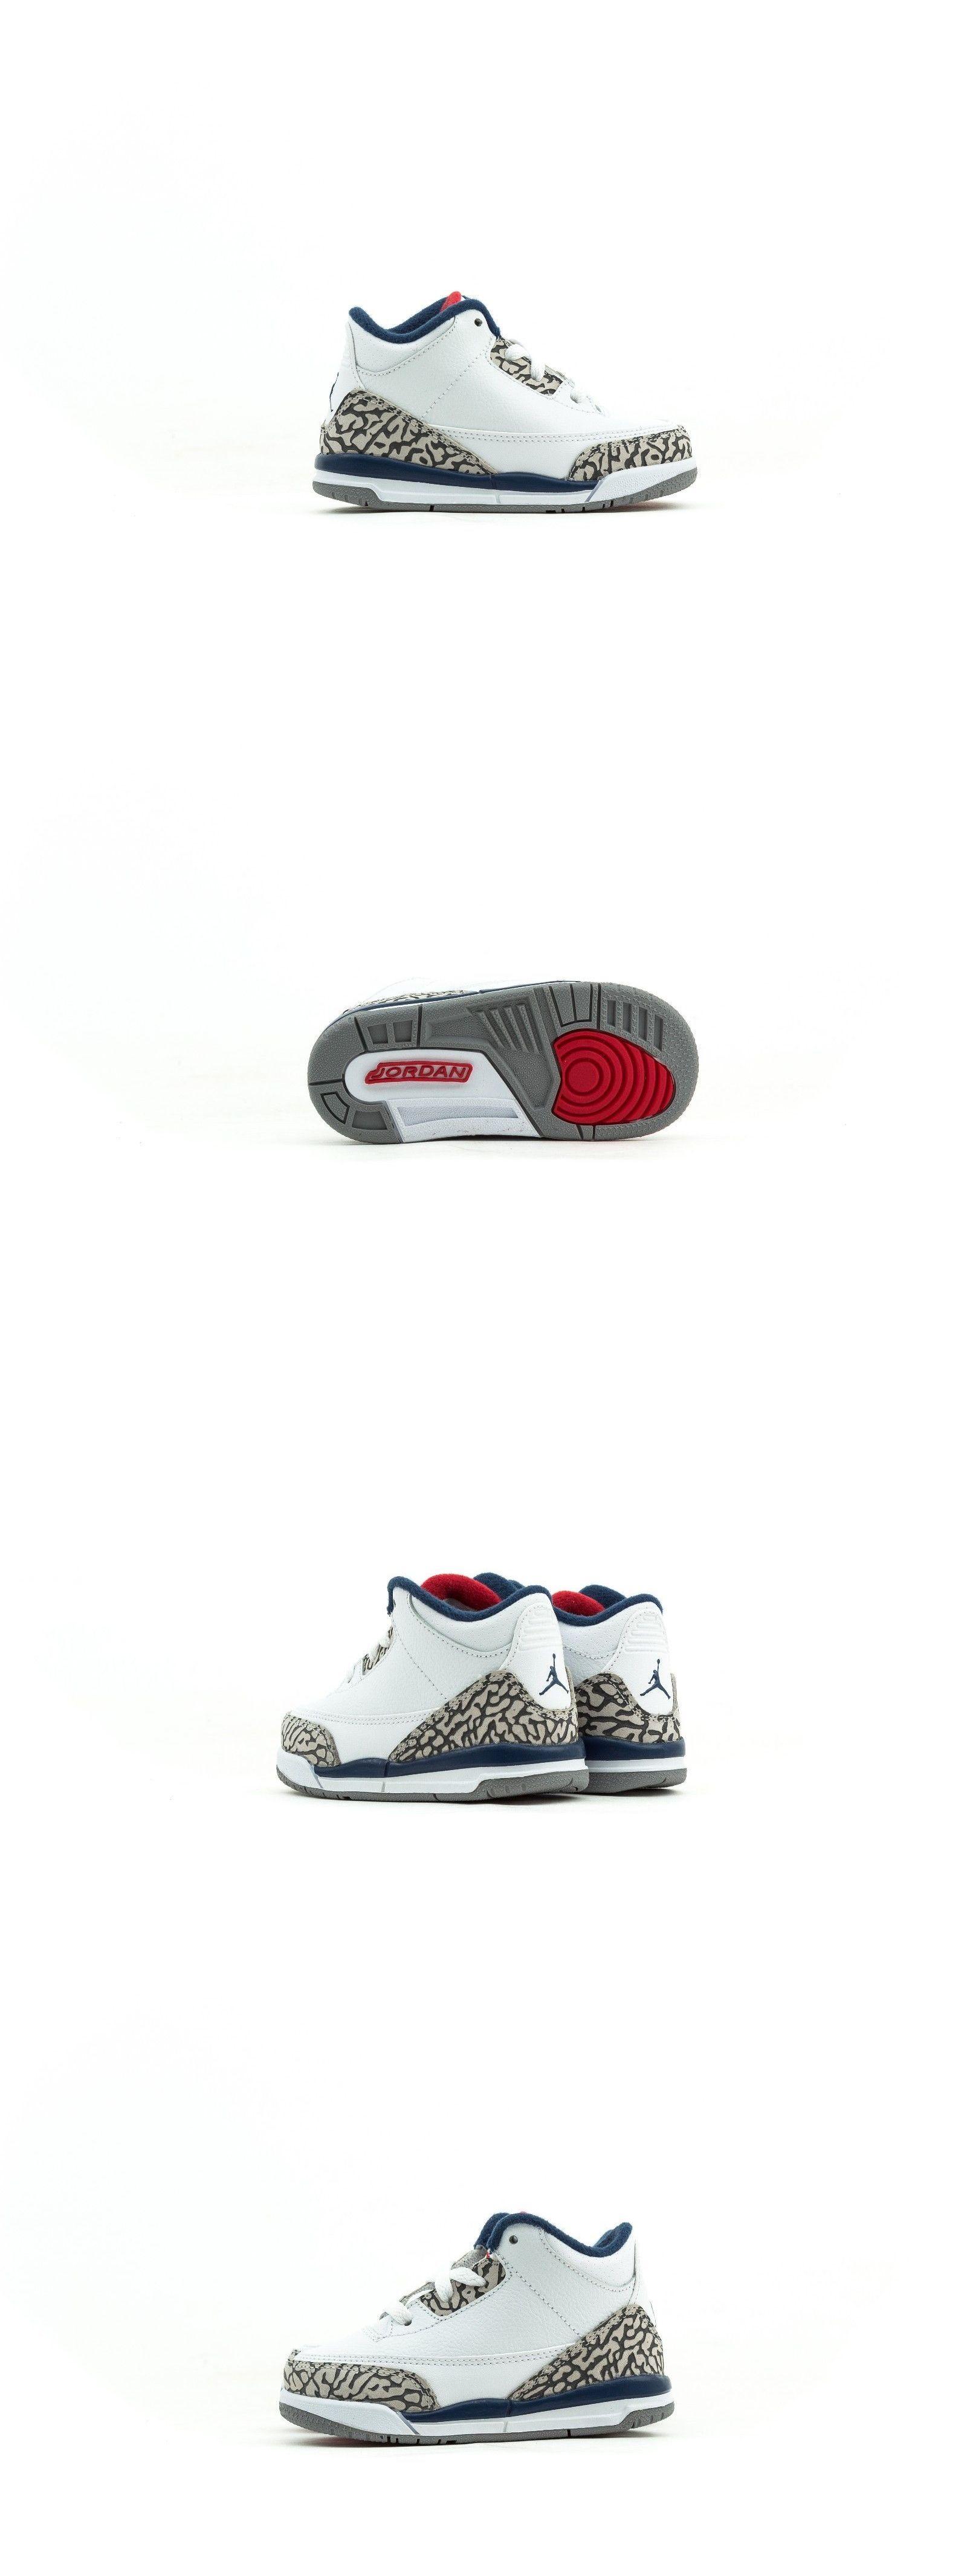 Baby Shoes Toddler S Nike Air Jordan Retro 3 Tb True Blue